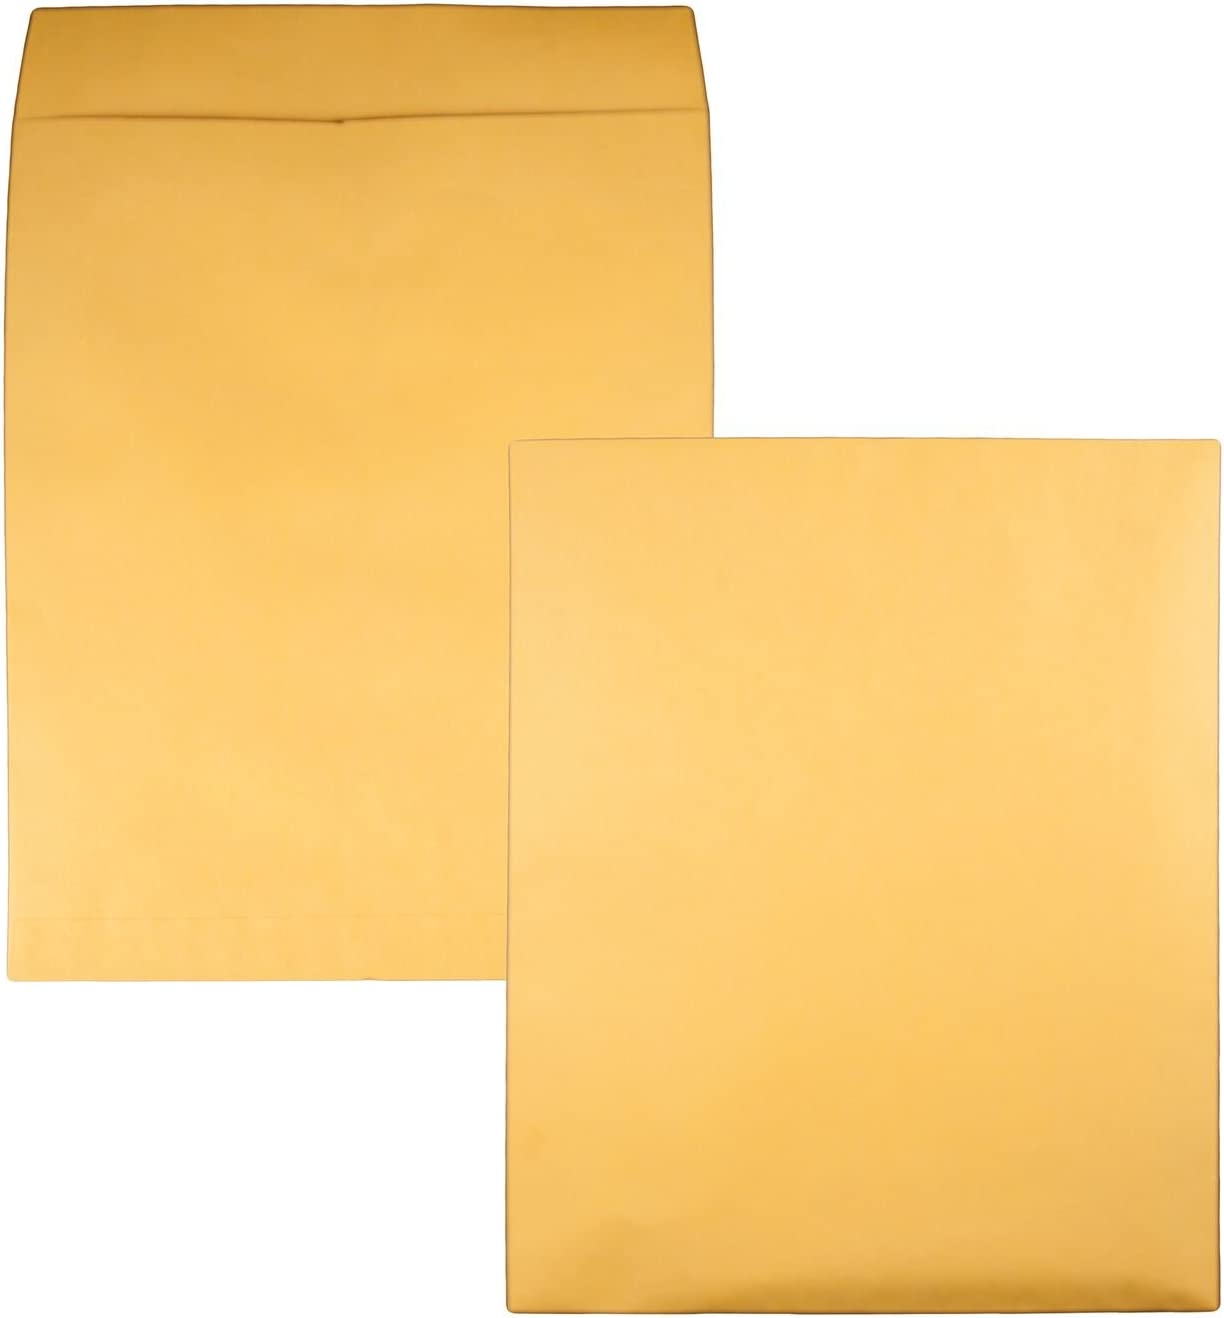 Quality Park Jumbo Kraft Ungummed Limited price Brown Envelopes Popular standard 14x18